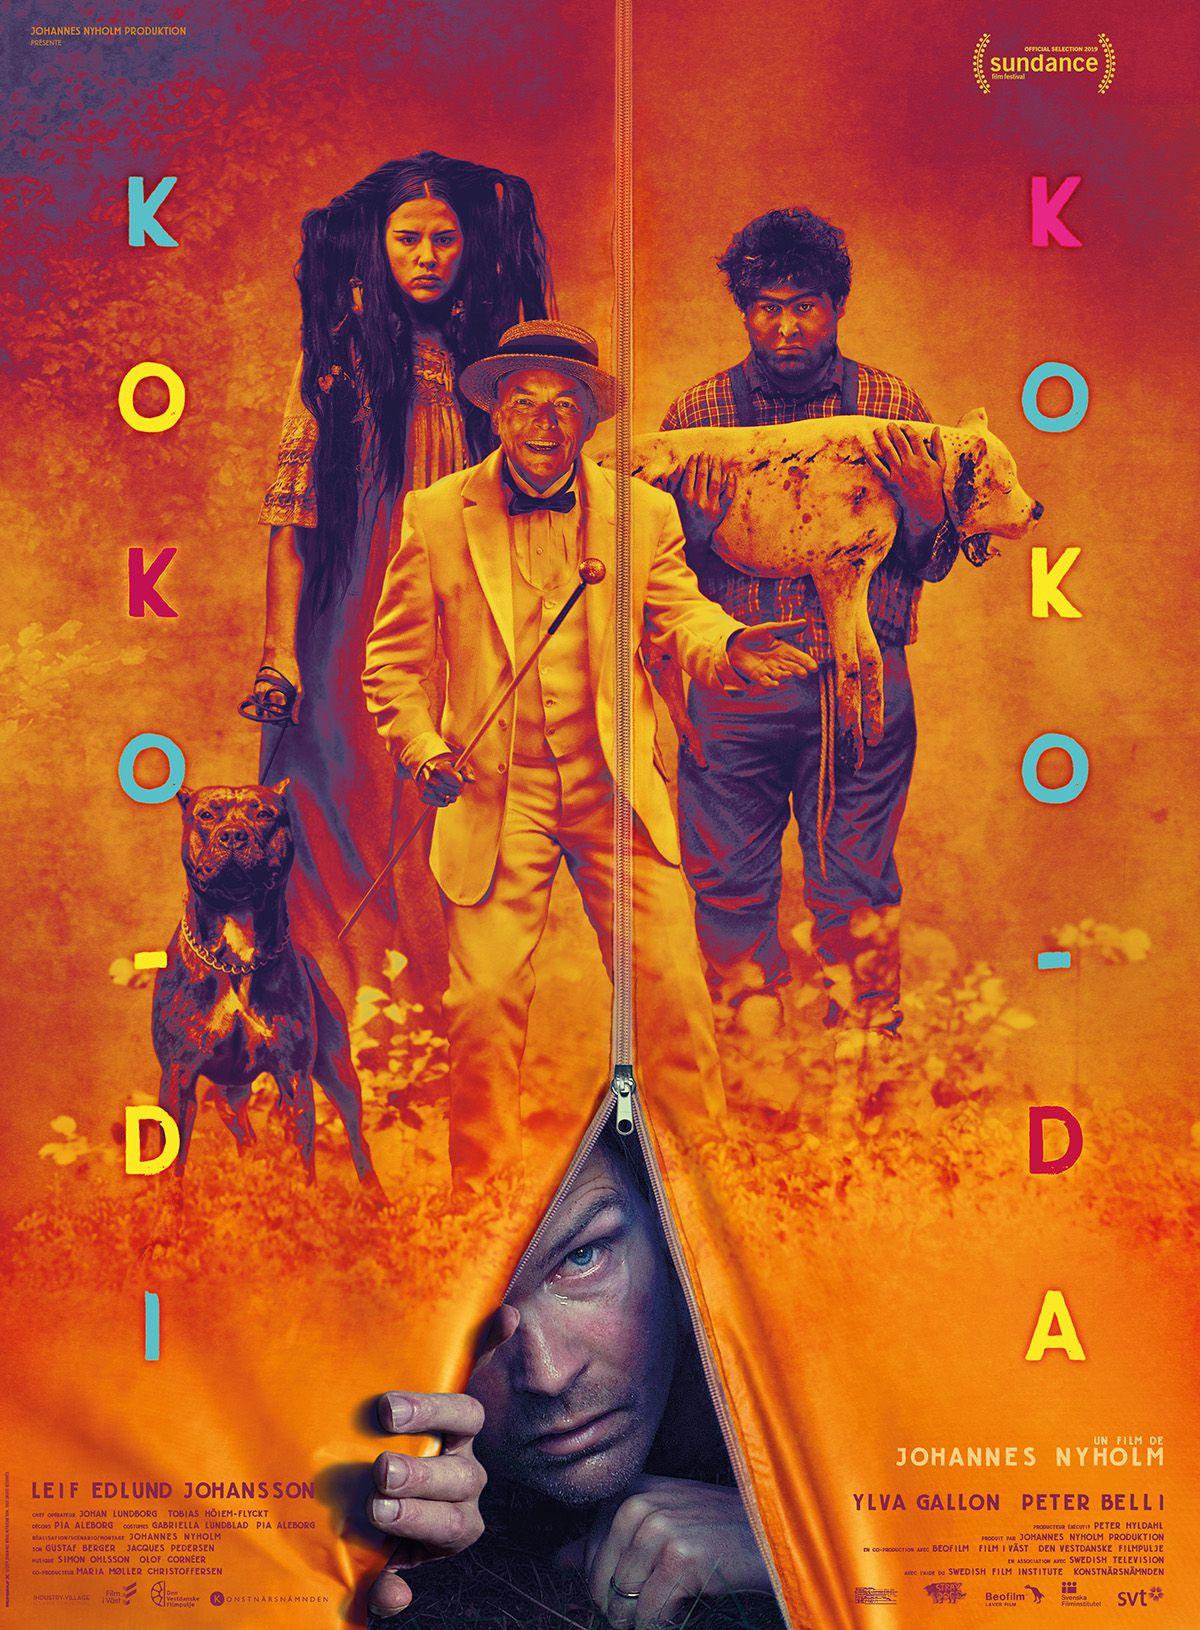 Koko-di Koko-da - Film (2019)